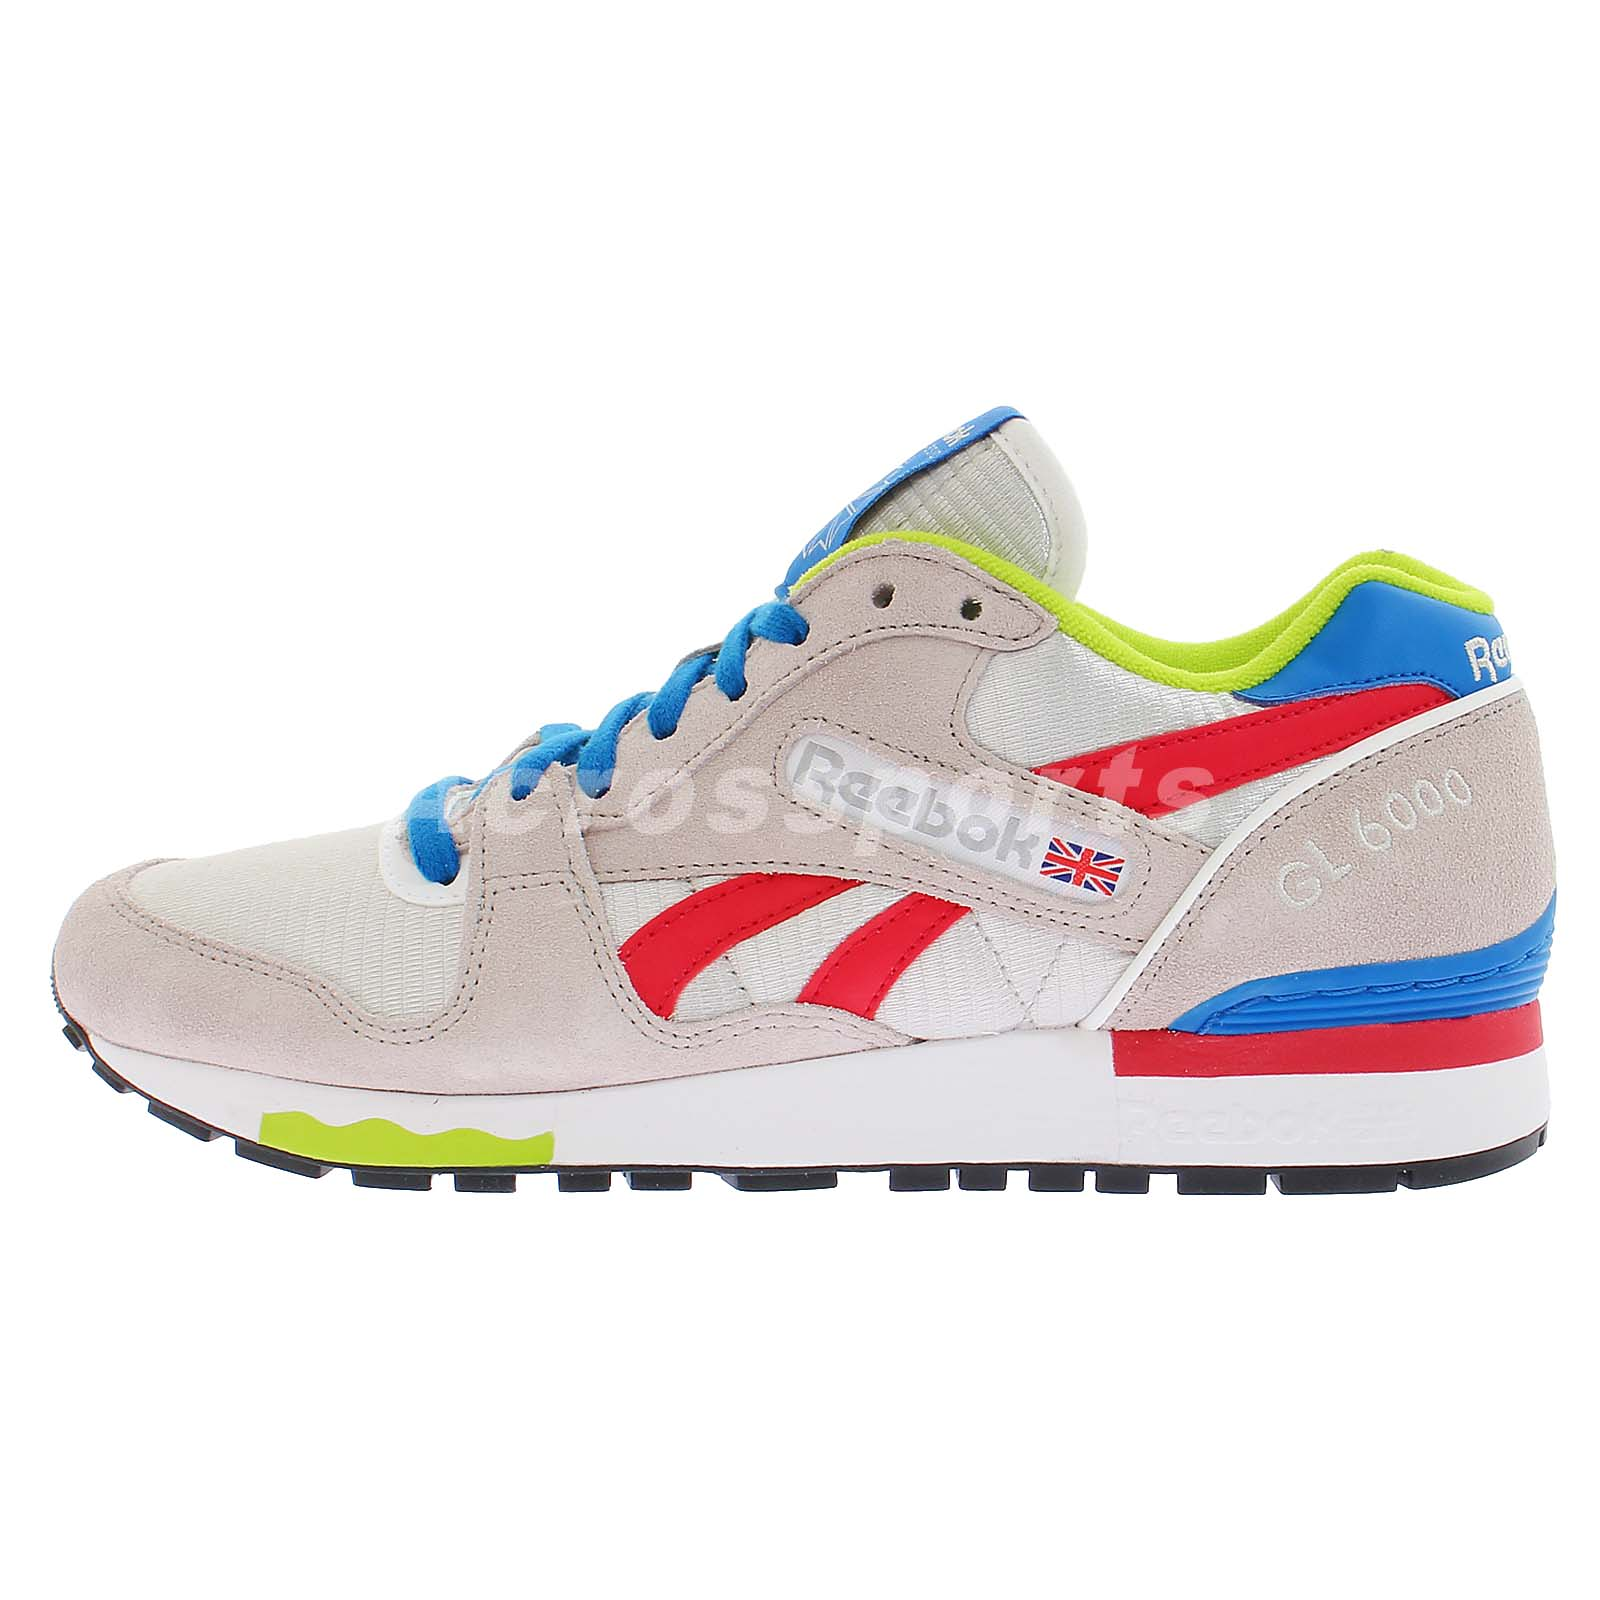 Reebok Running Shoes 2013 Reebok GL 6000 Grey 20...